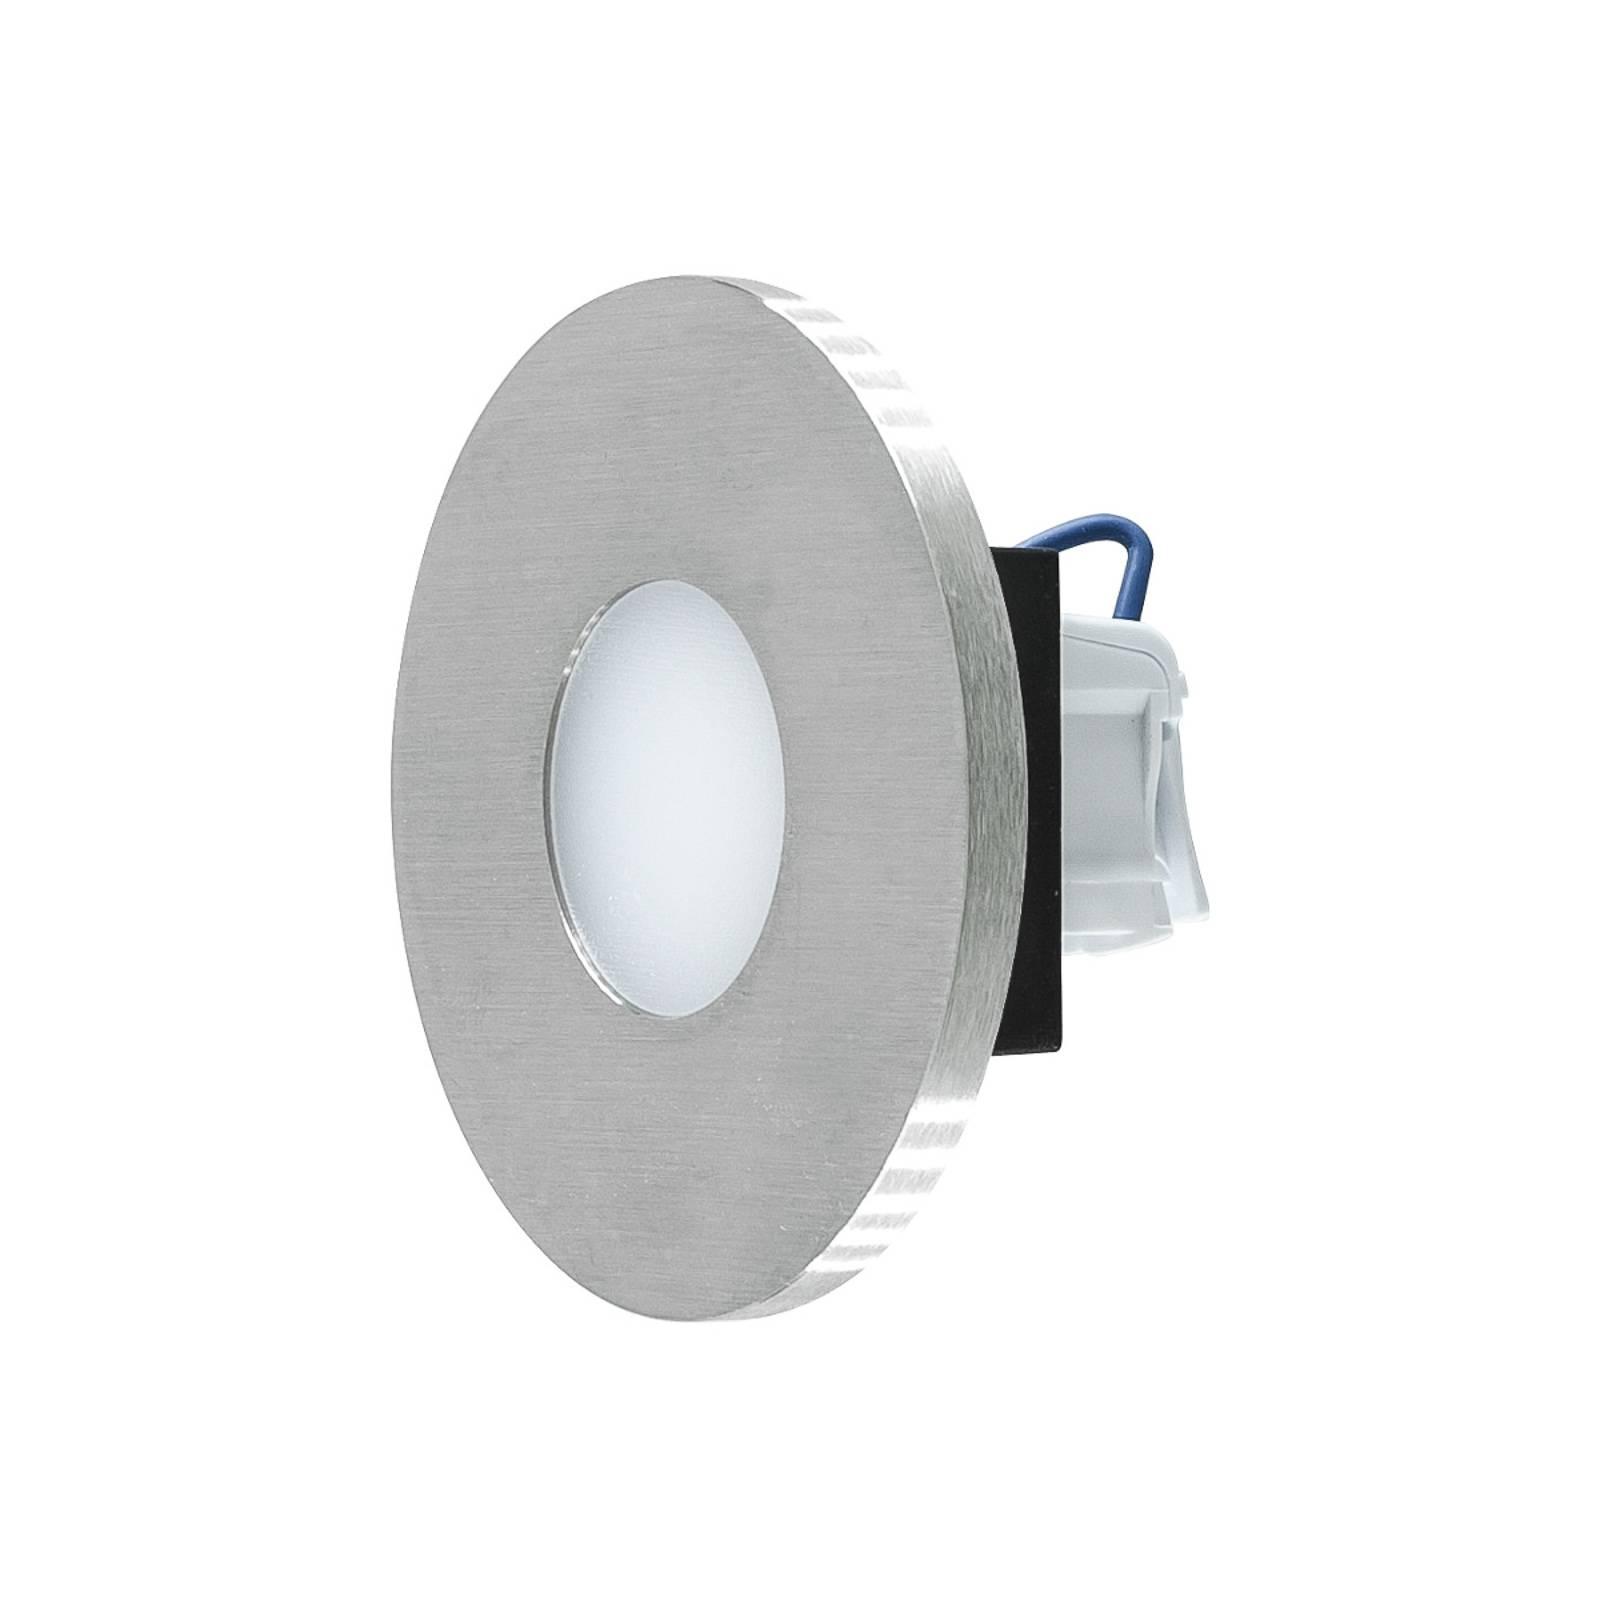 EVN LR230 applique LED encastrable direct inox